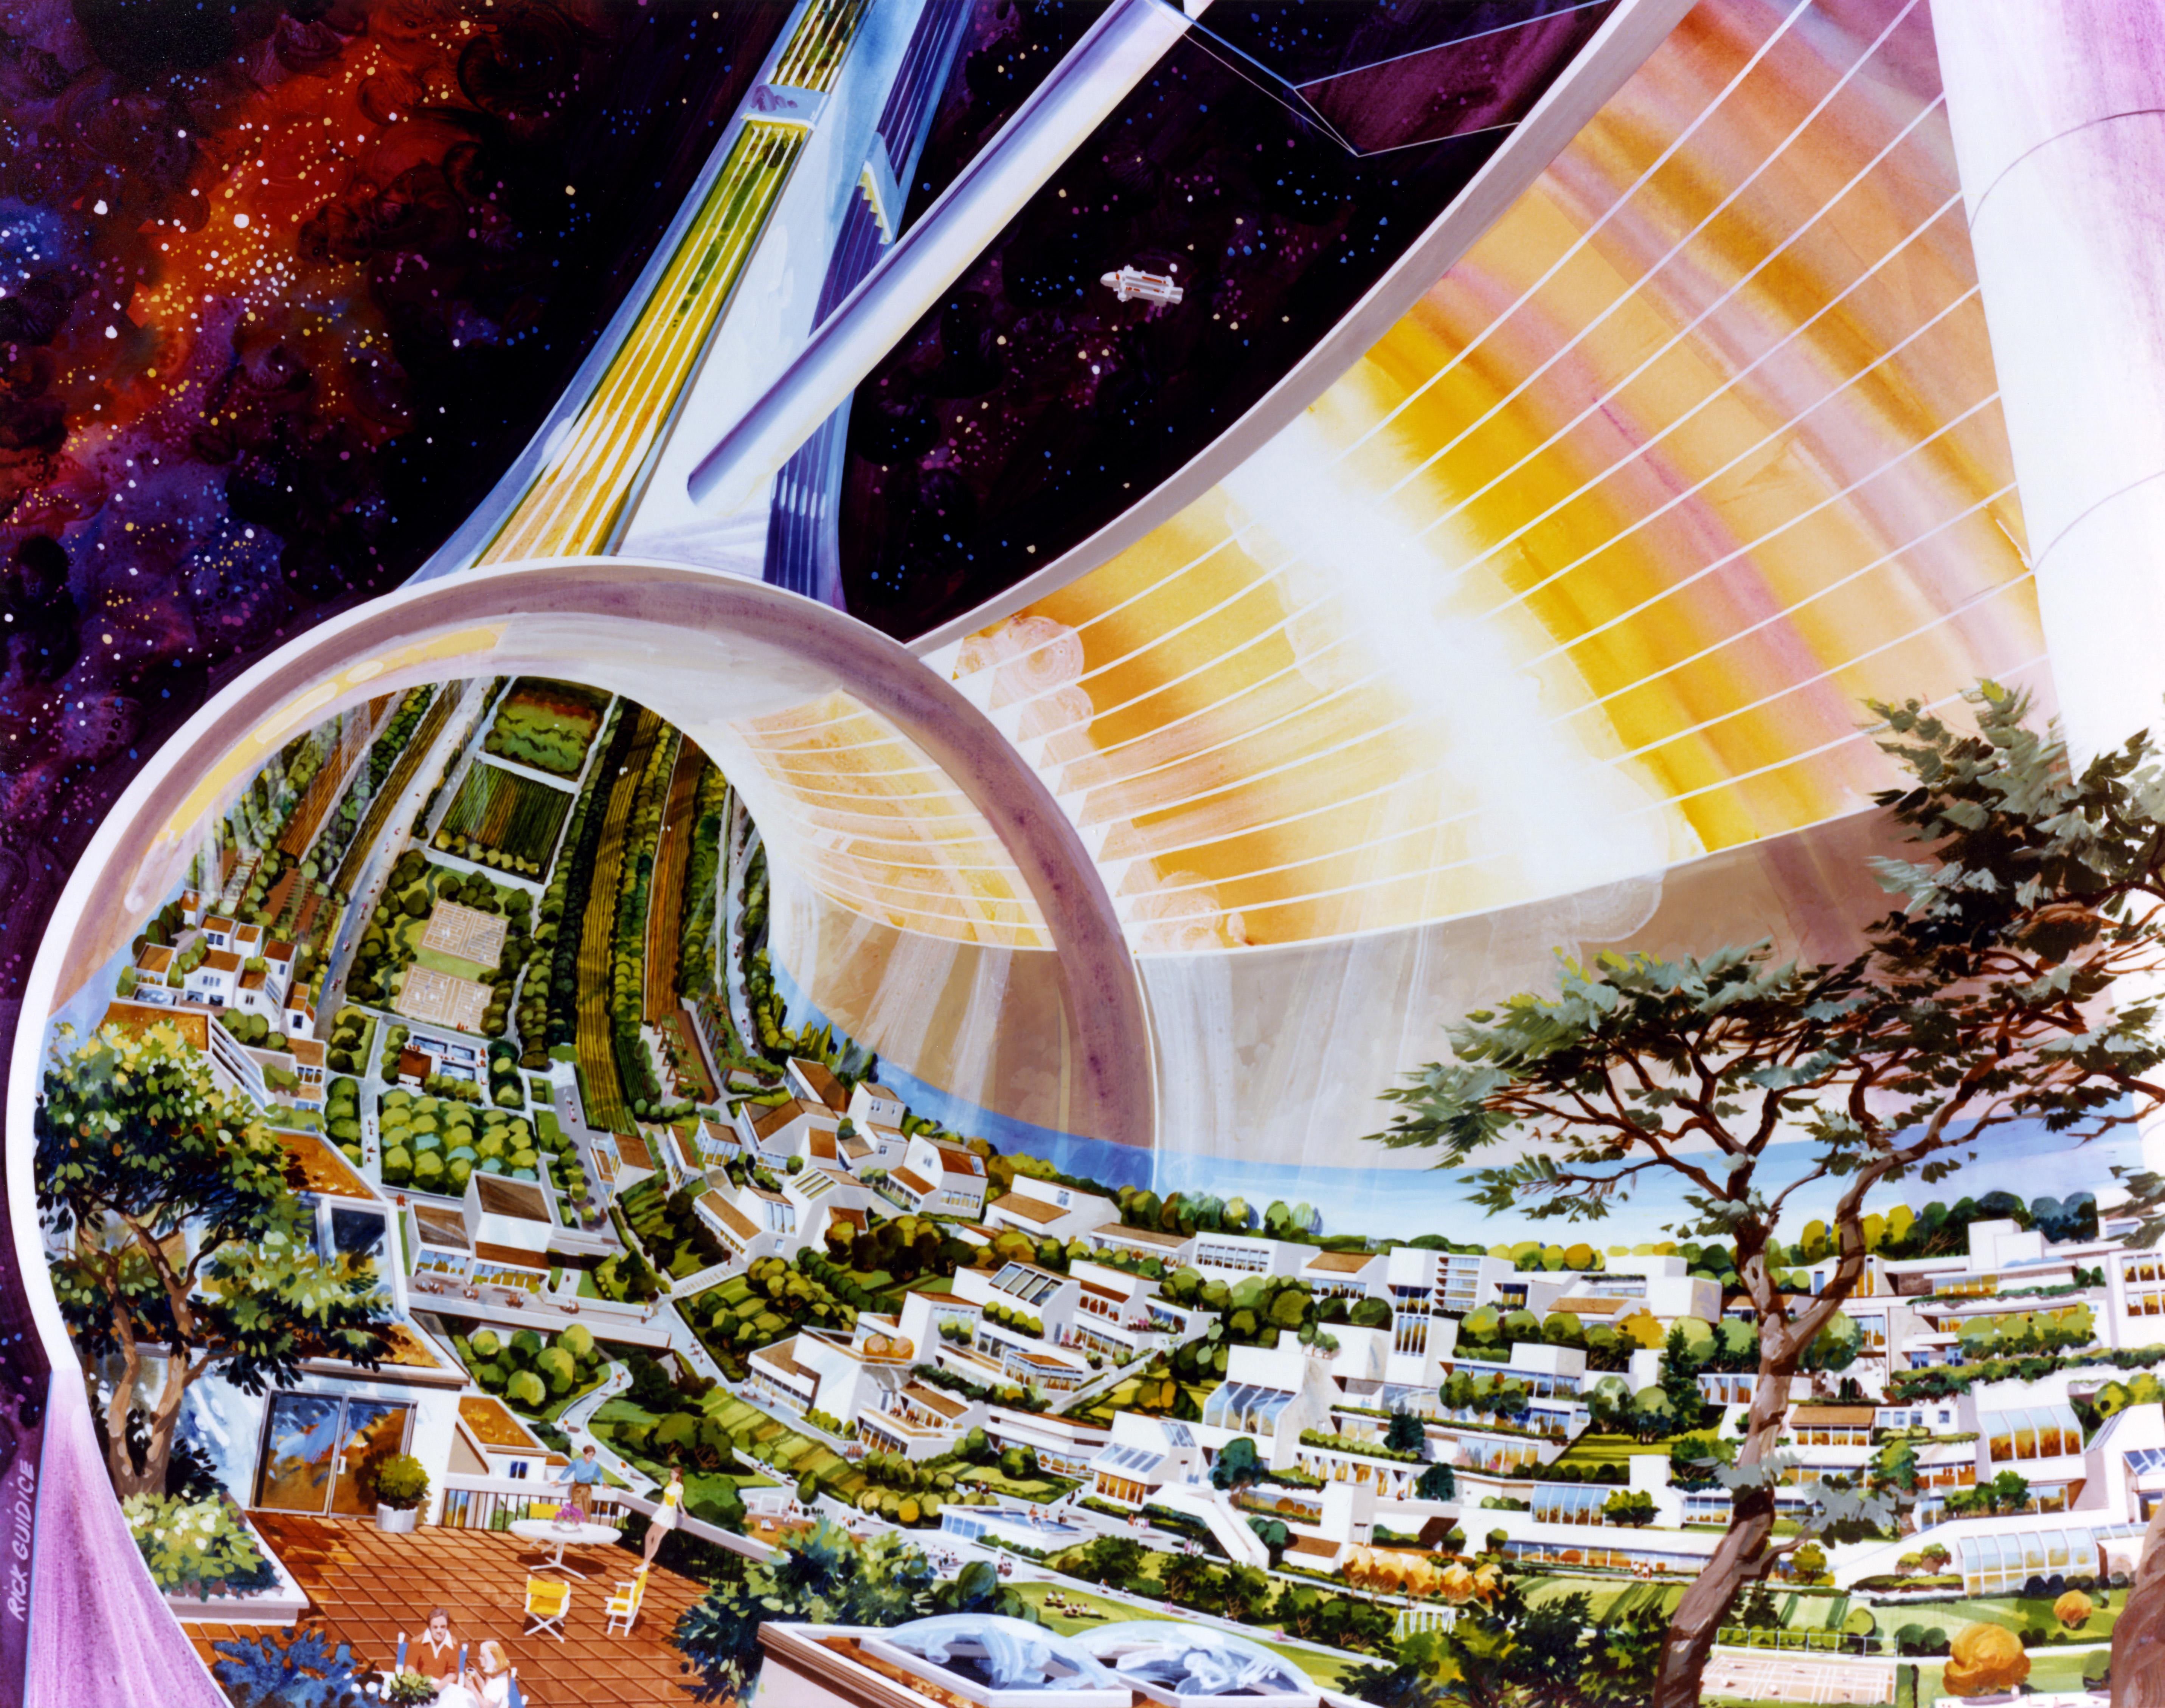 NASA Toroidal Colonies